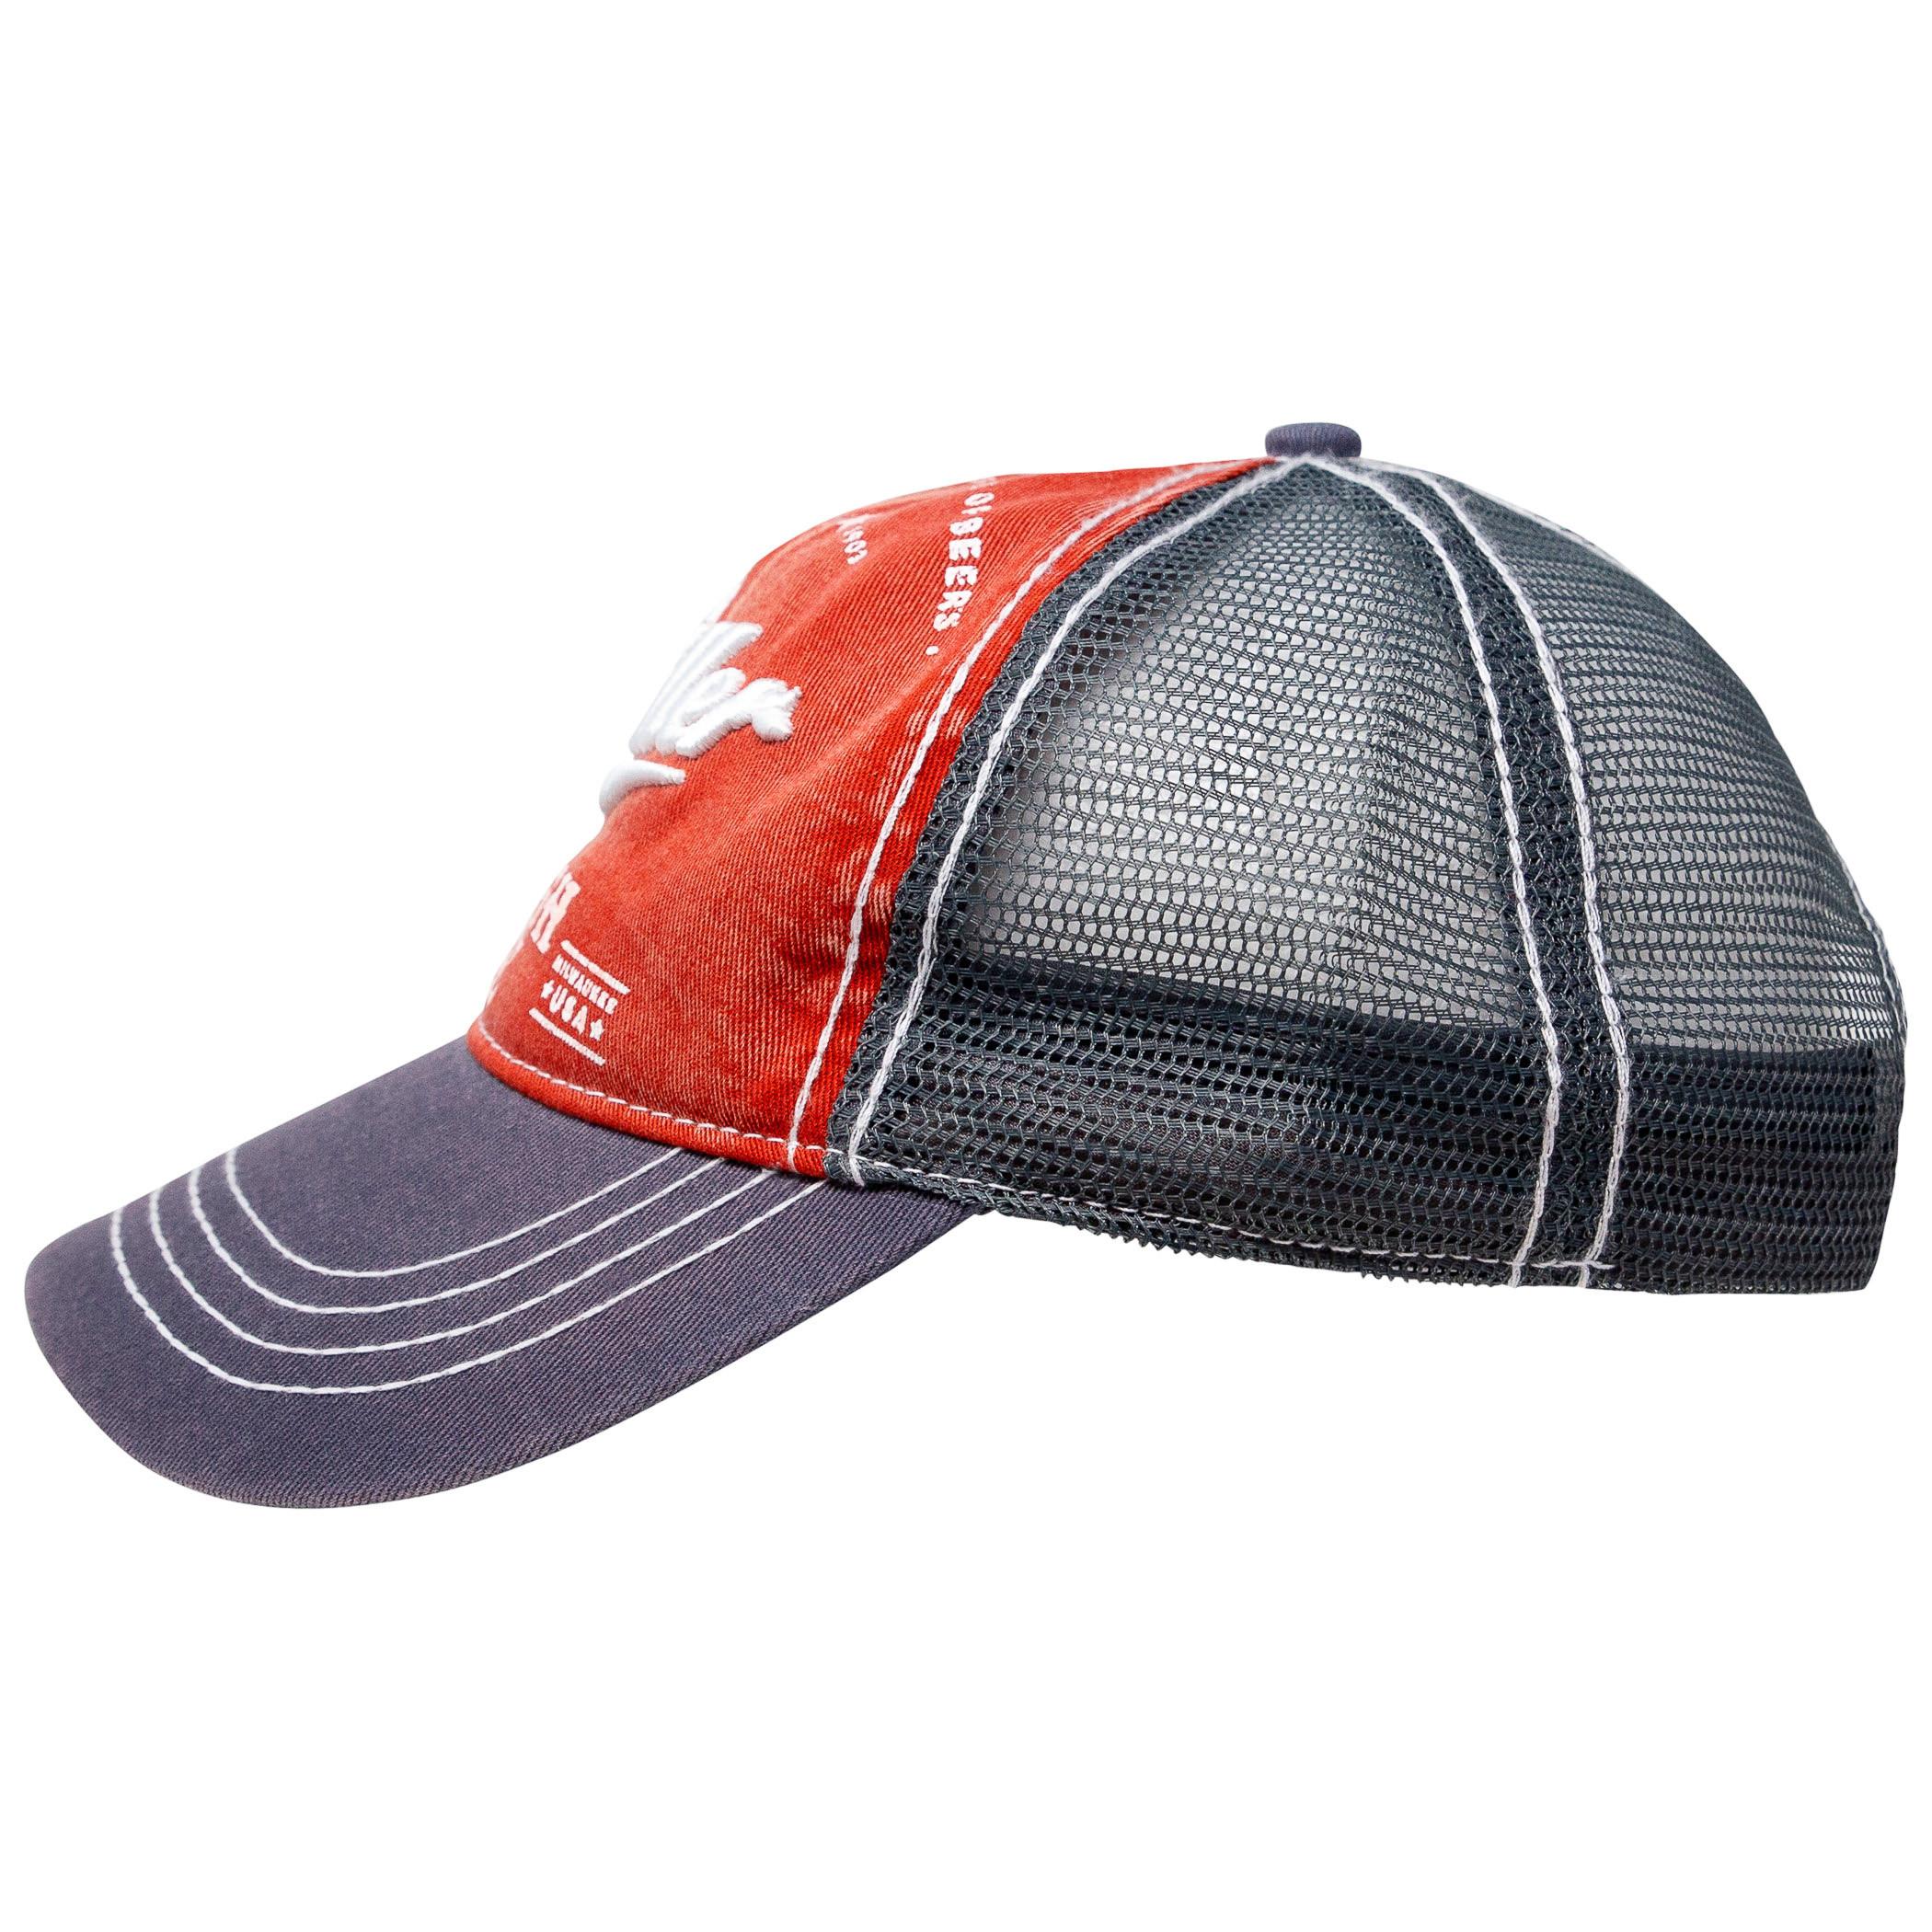 Miller High Life Beer Black And Red Adjustable Trucker Hat